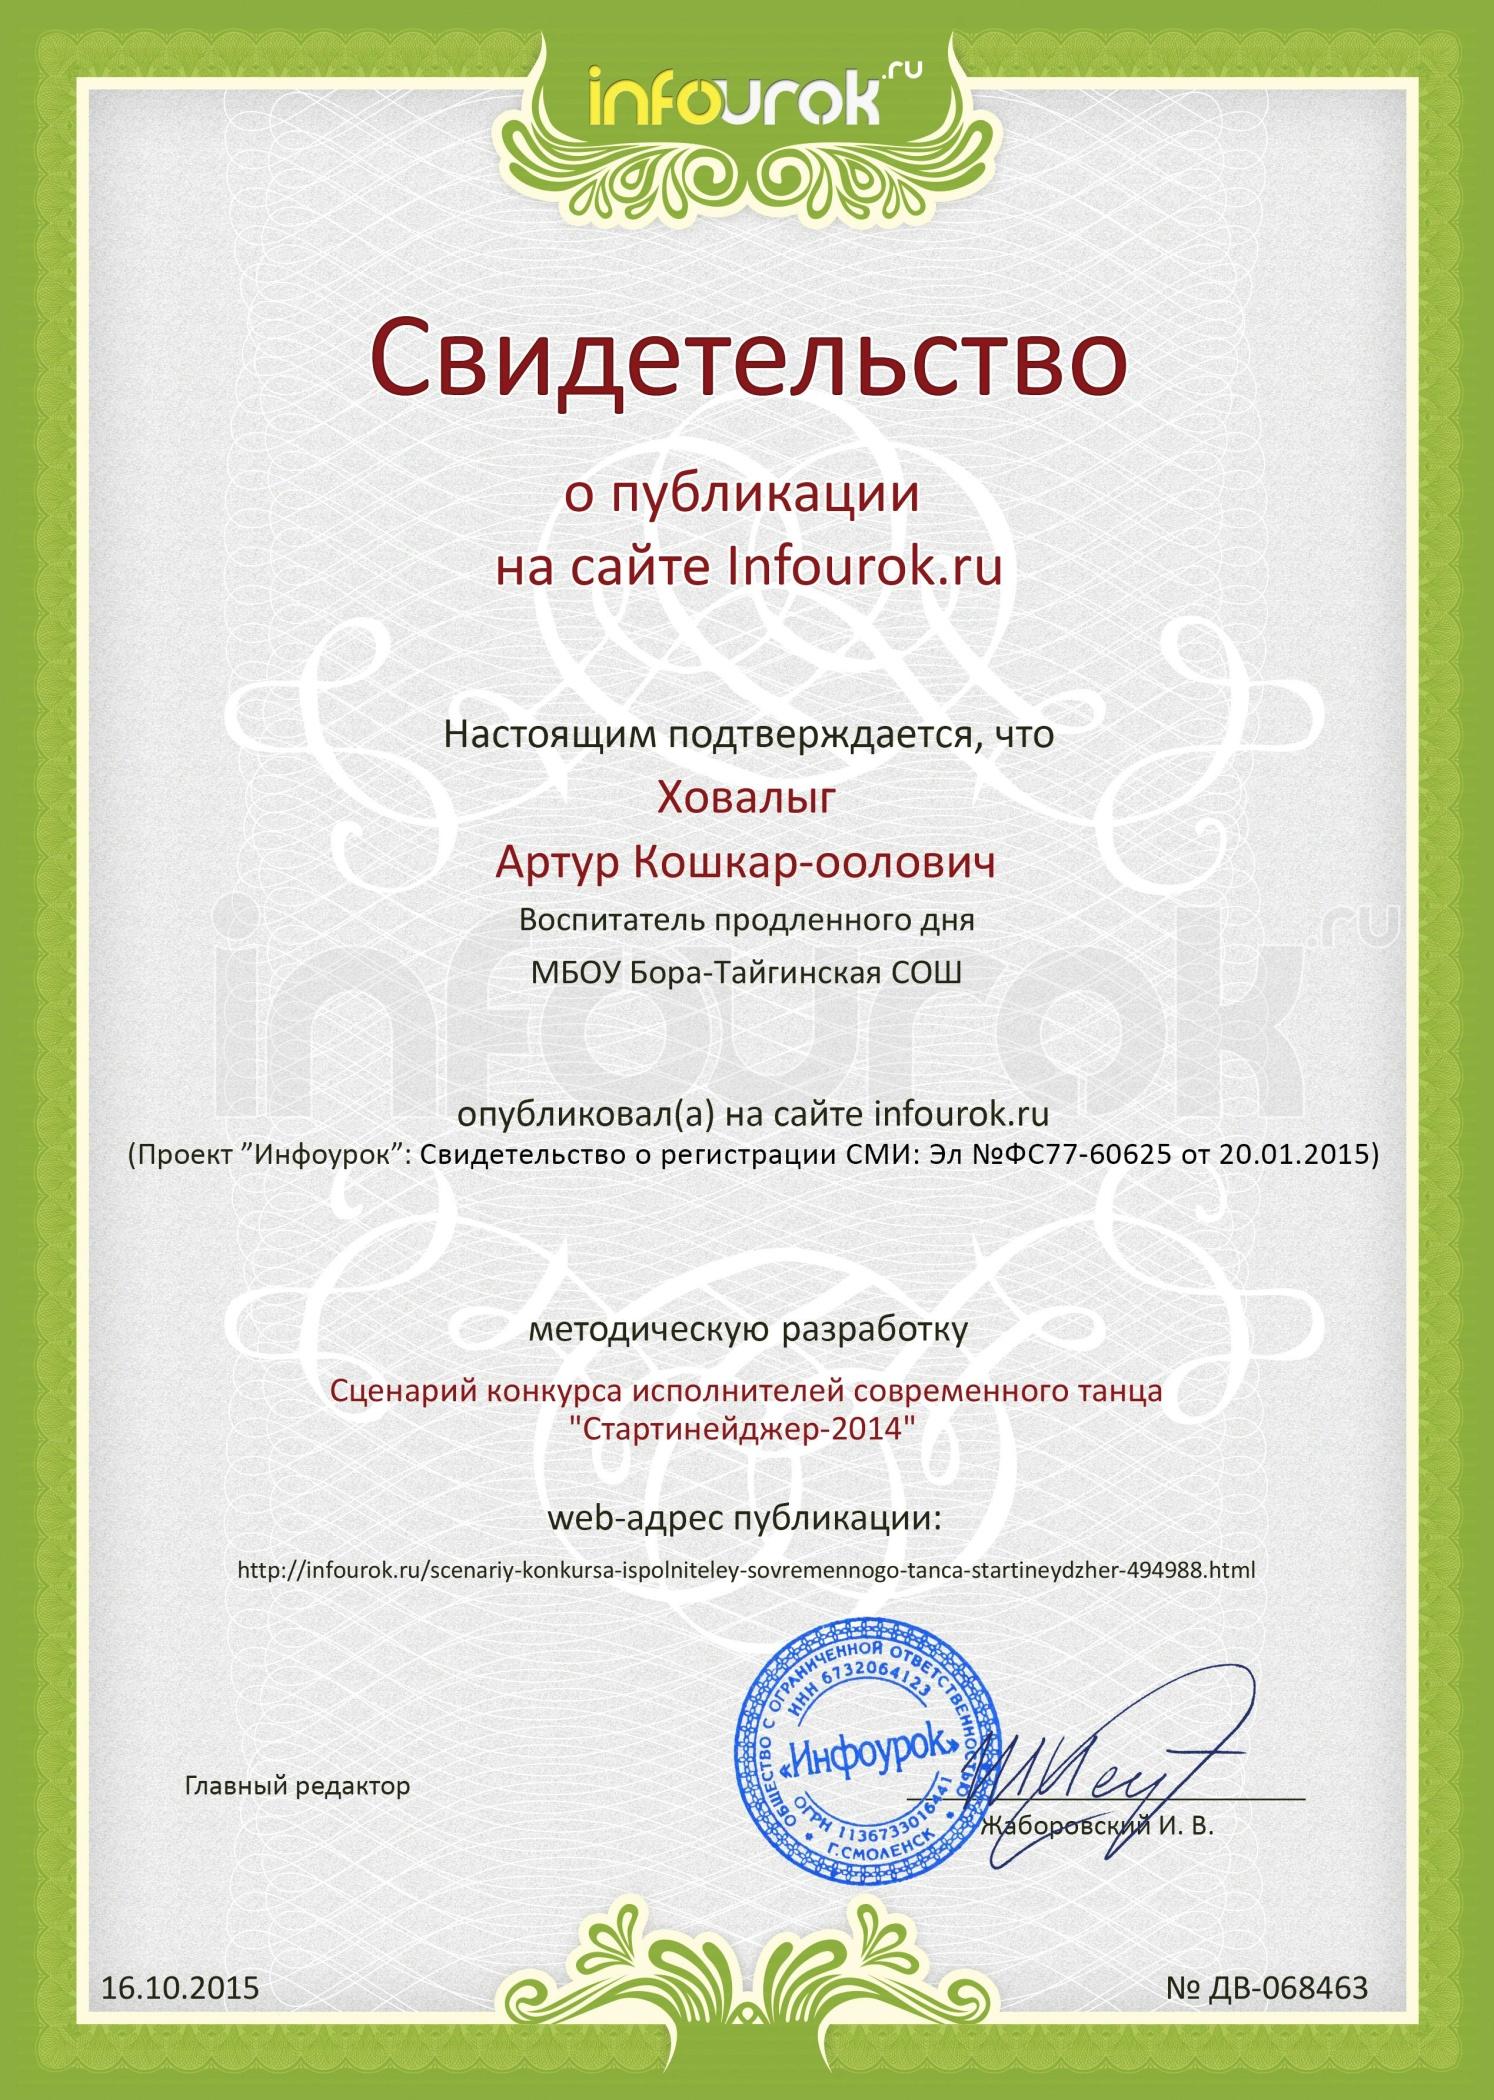 C:\Users\2015\Downloads\Сертификат проекта Infourok.ru № ДВ-068463.jpg